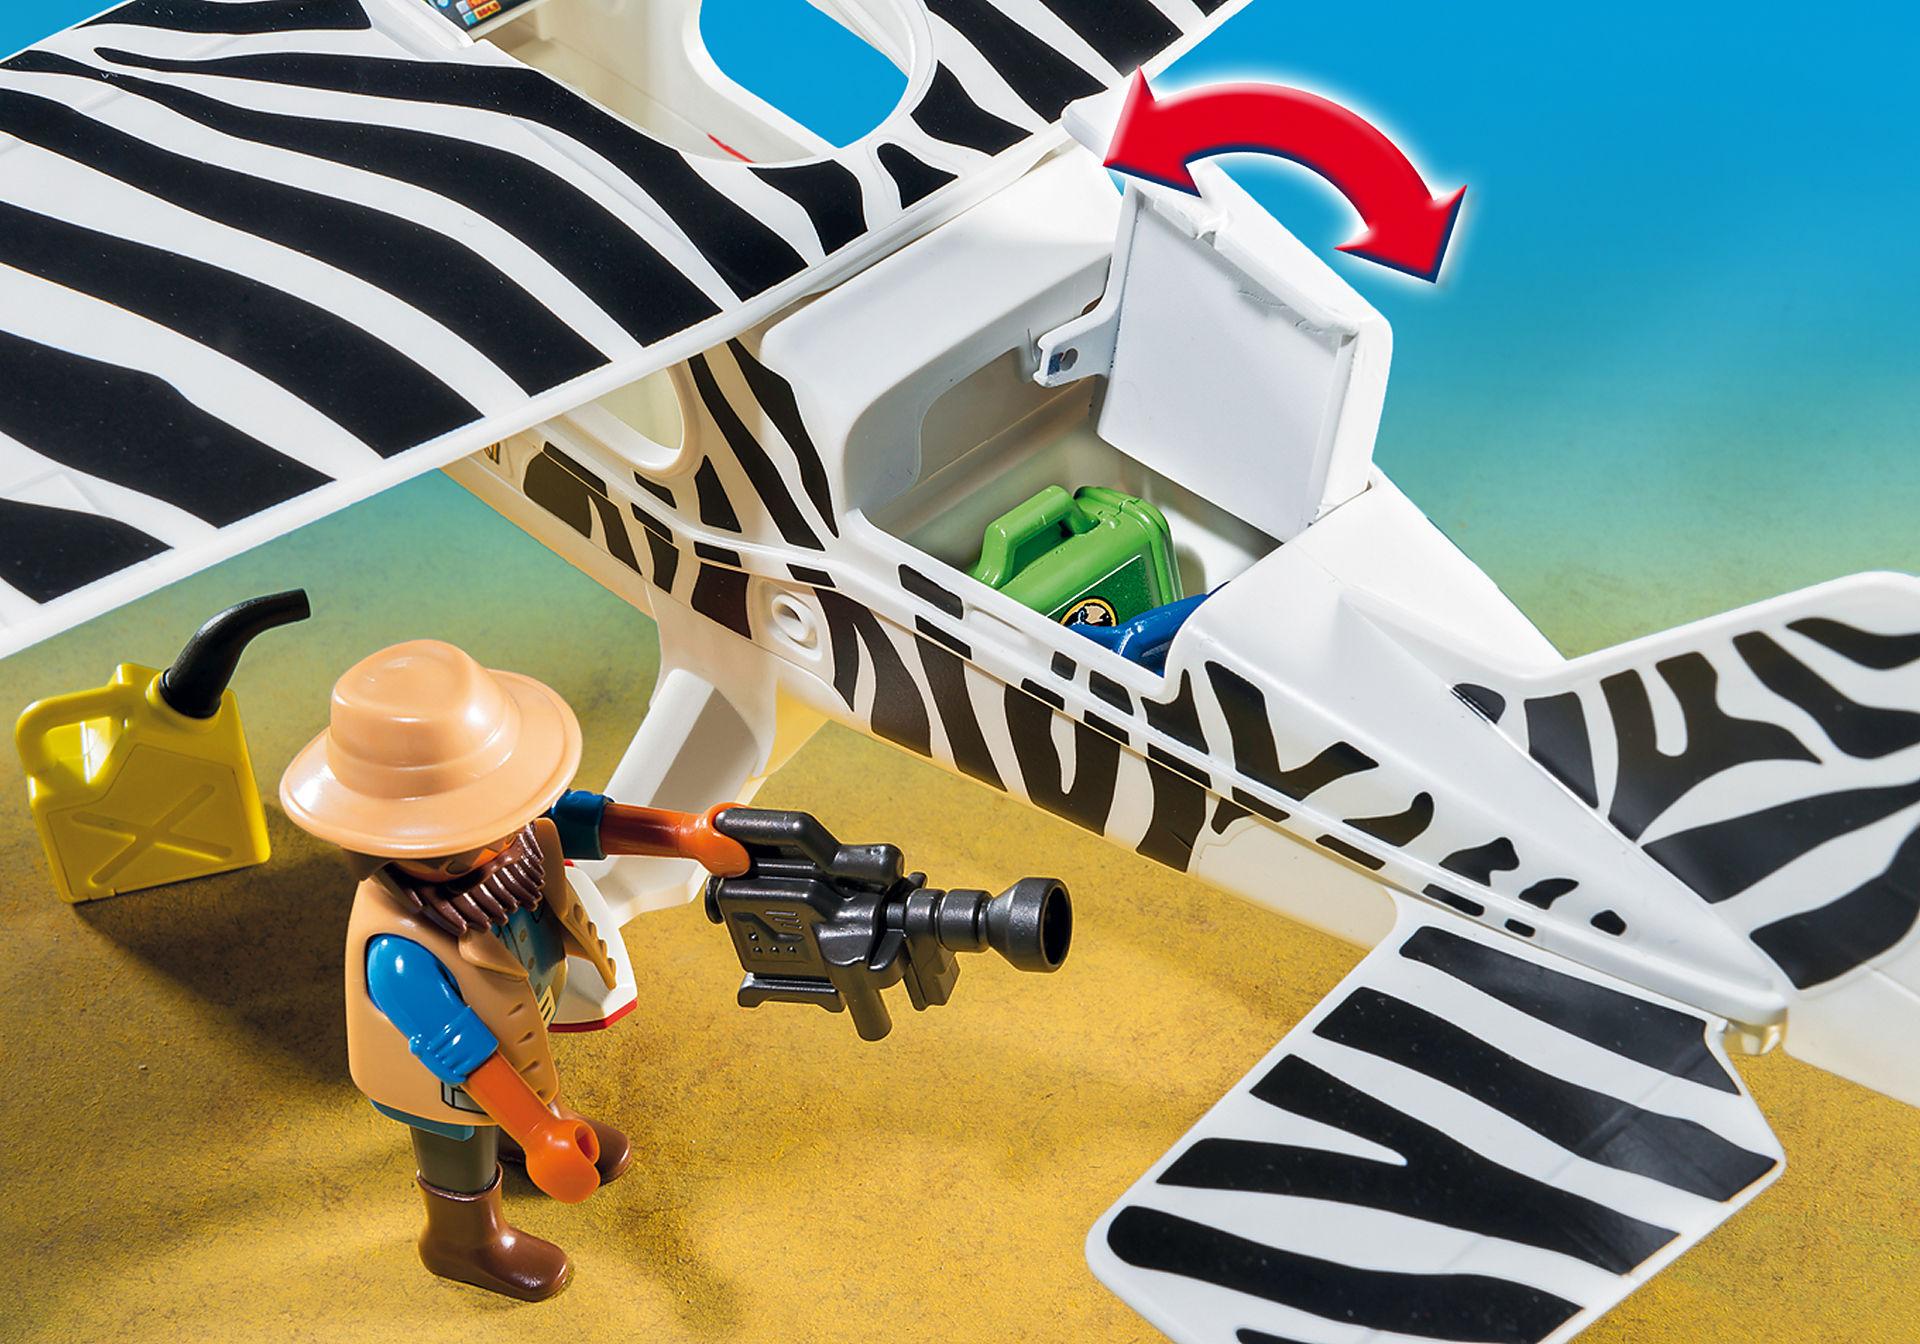 http://media.playmobil.com/i/playmobil/6938_product_extra1/Avioneta de safari